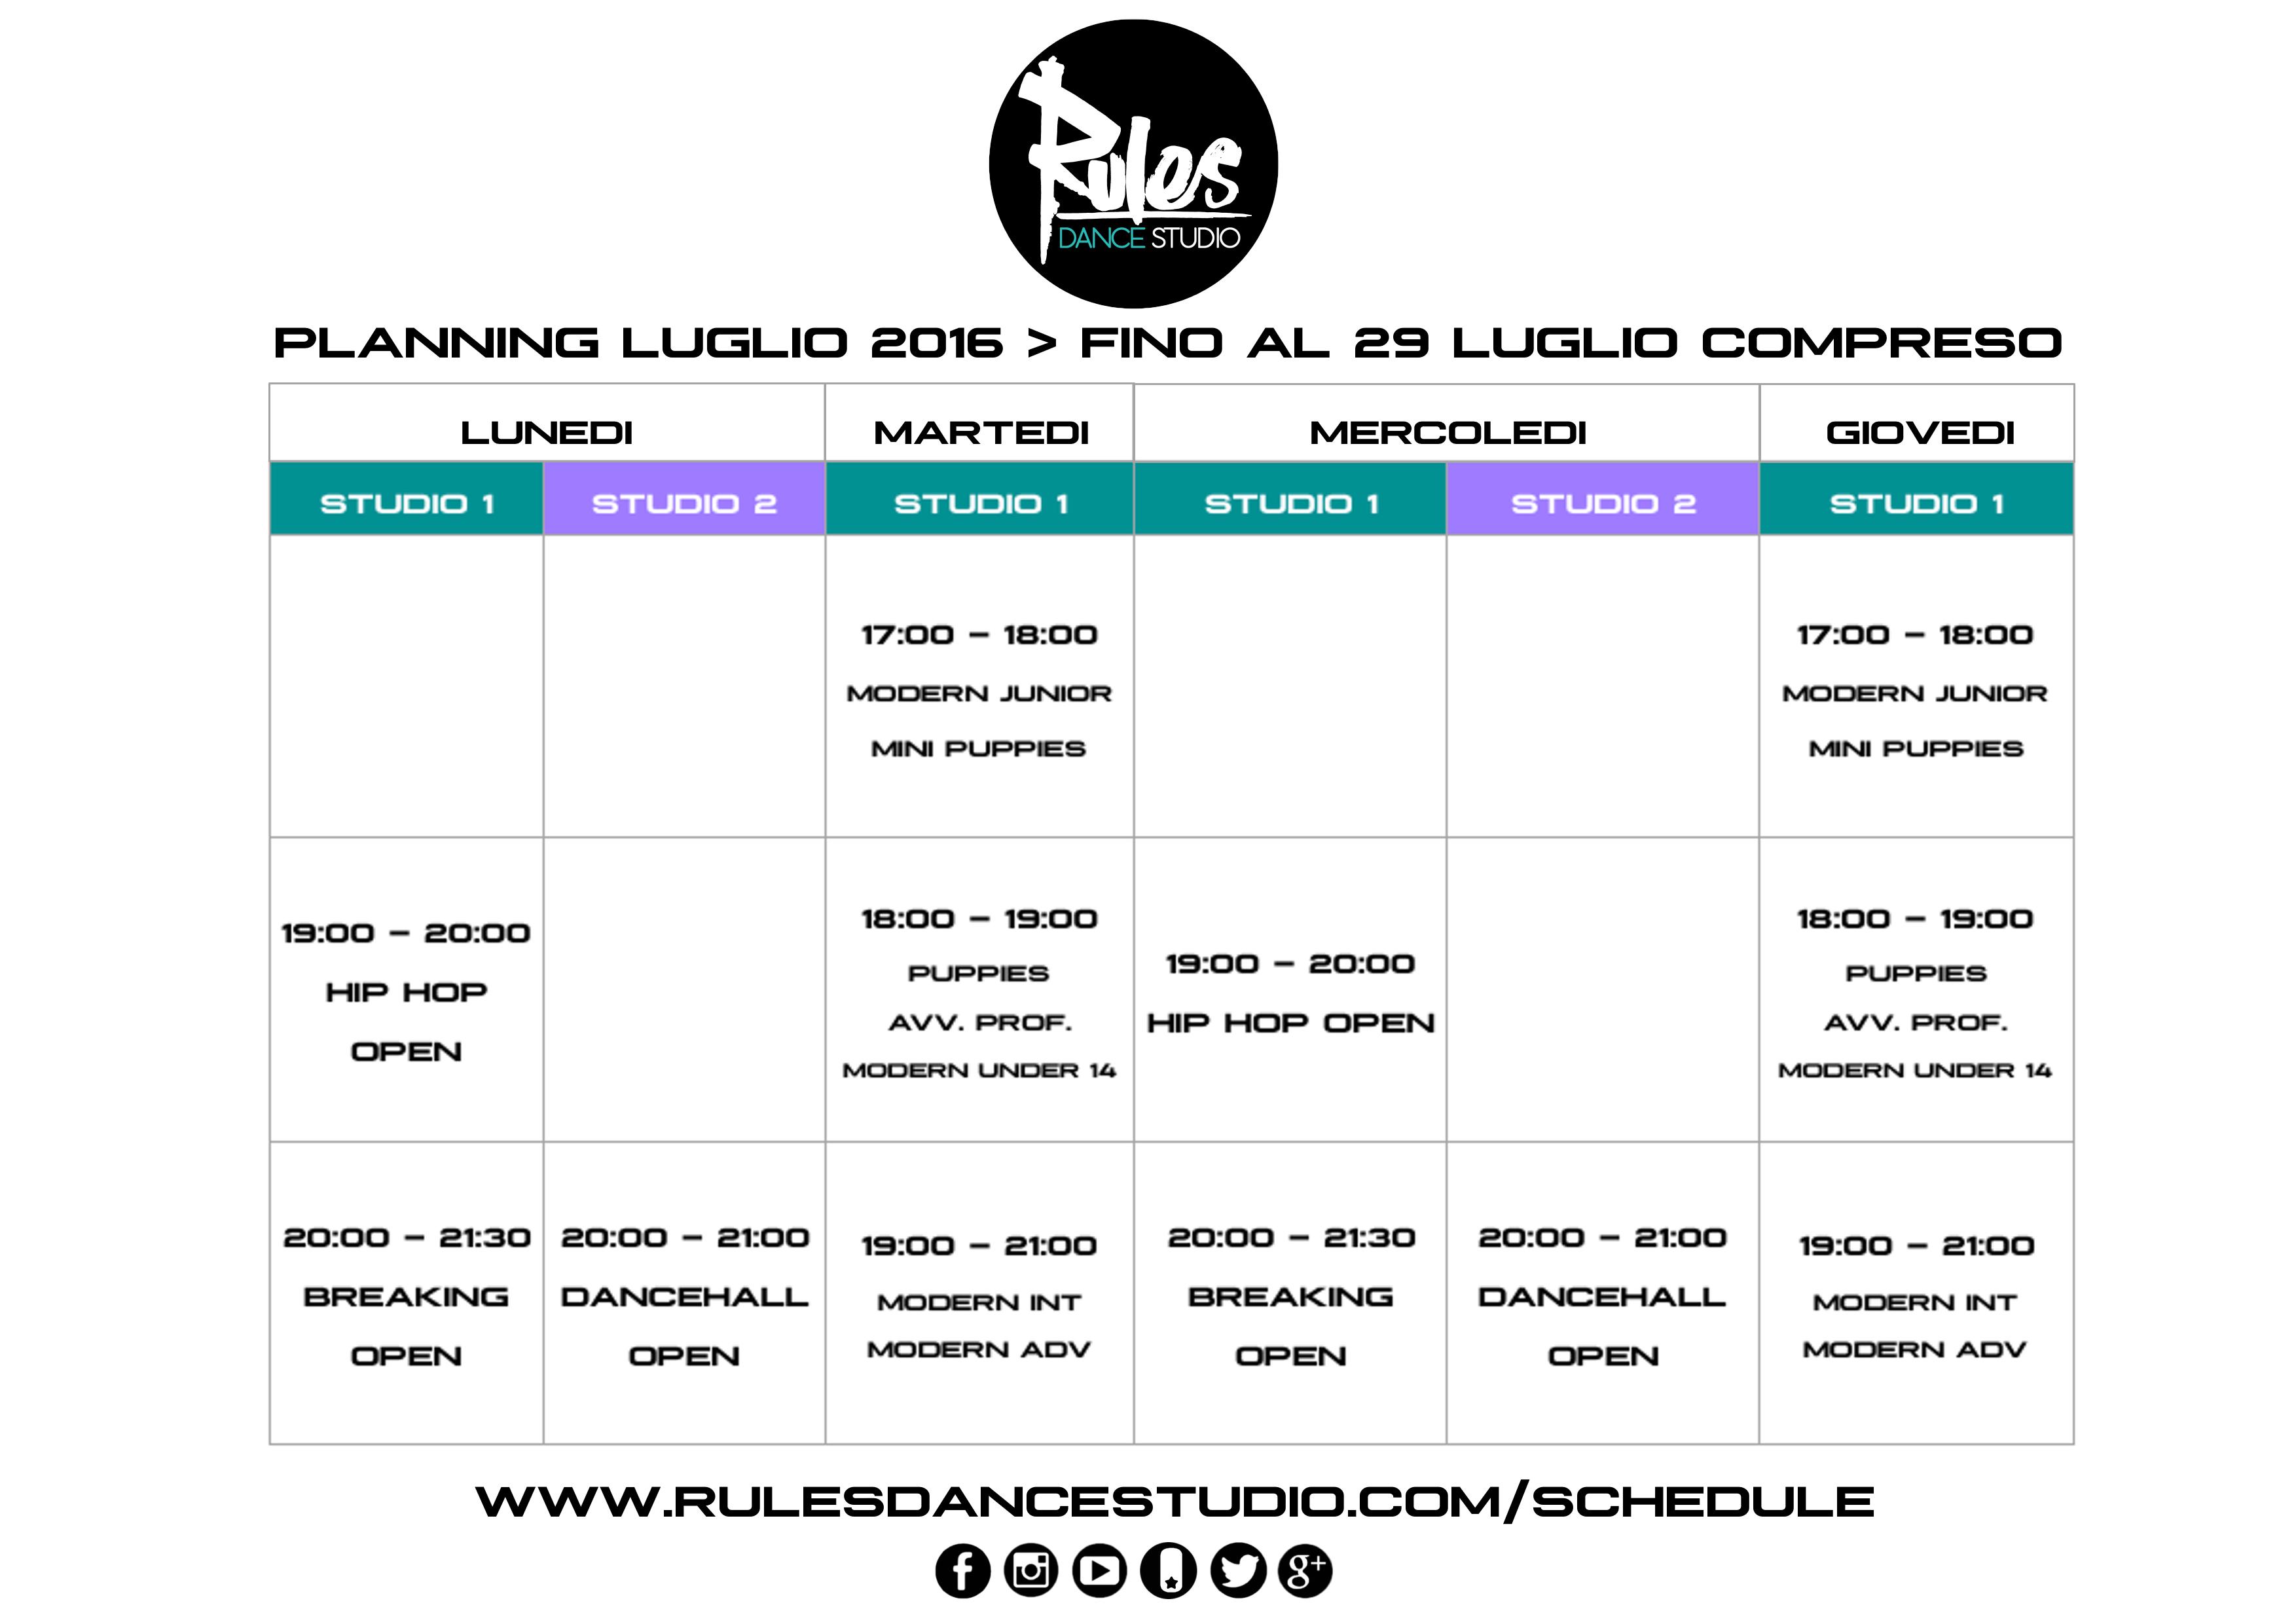 Planning Luglio 2016